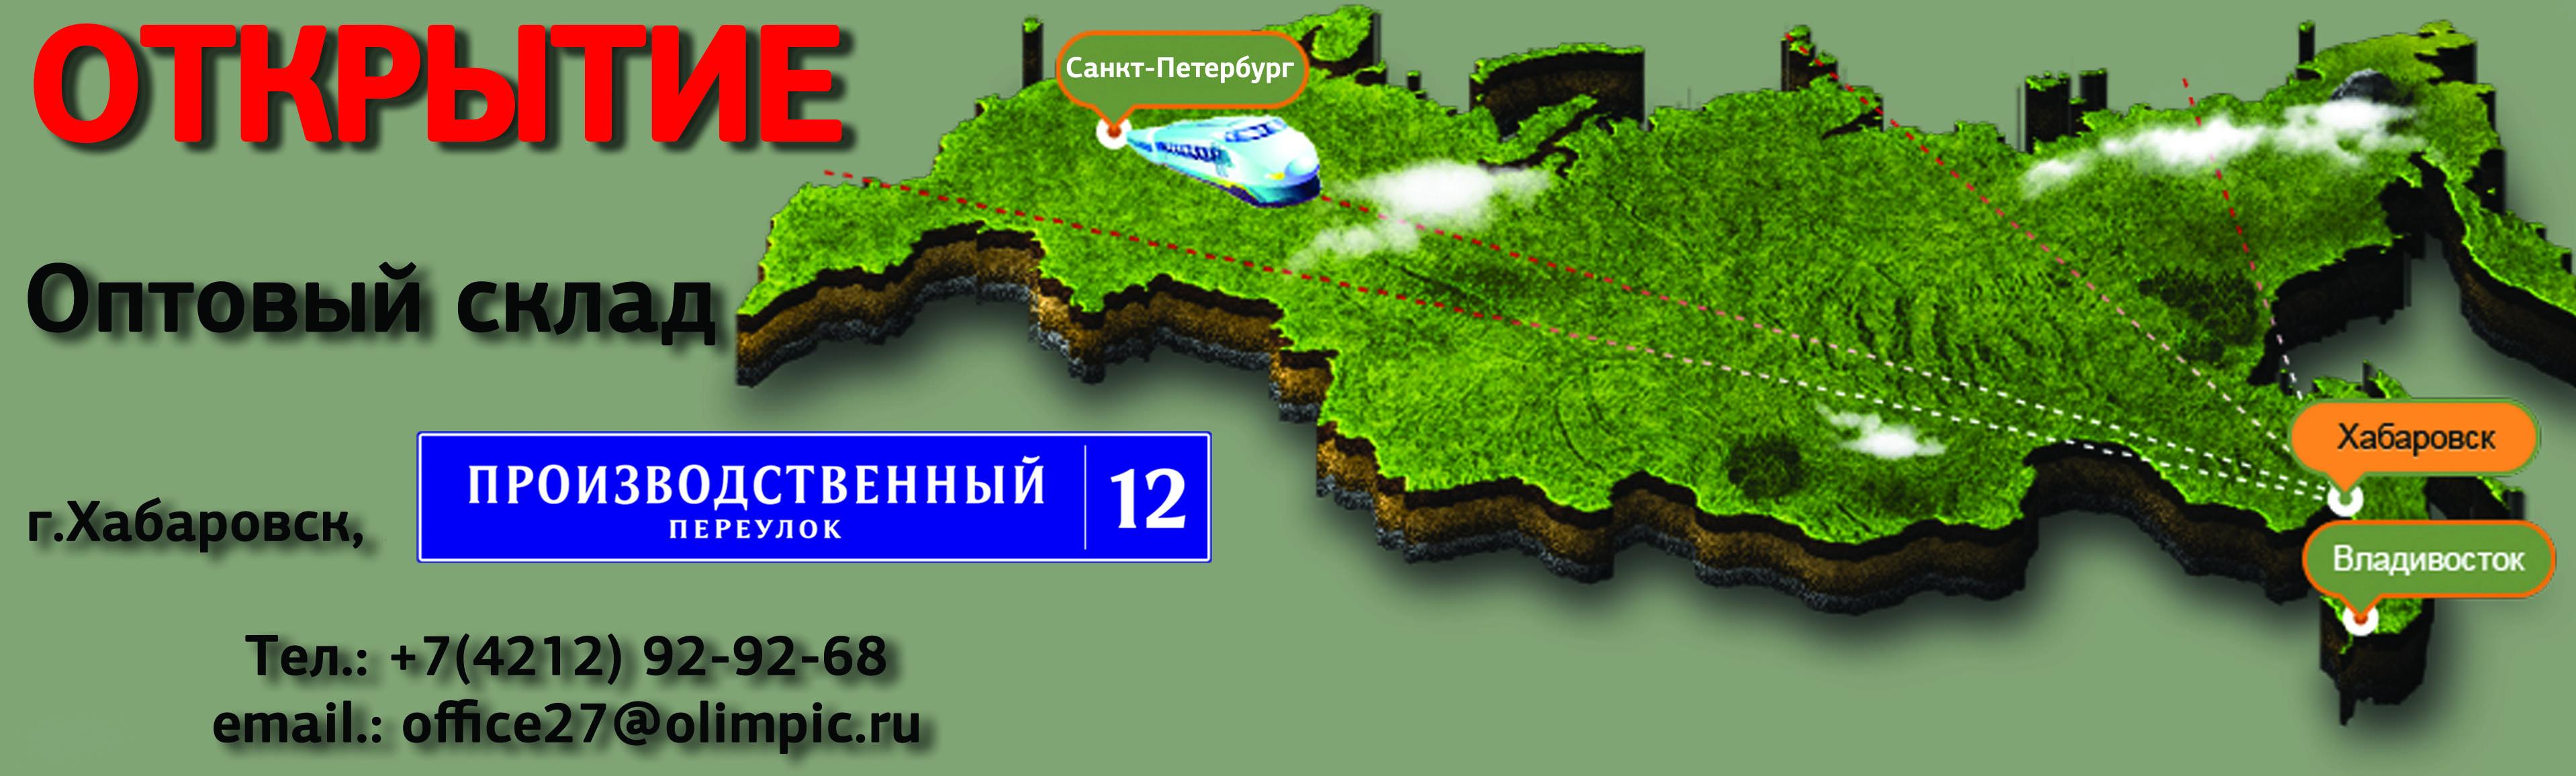 Открытие склада Хабаровск